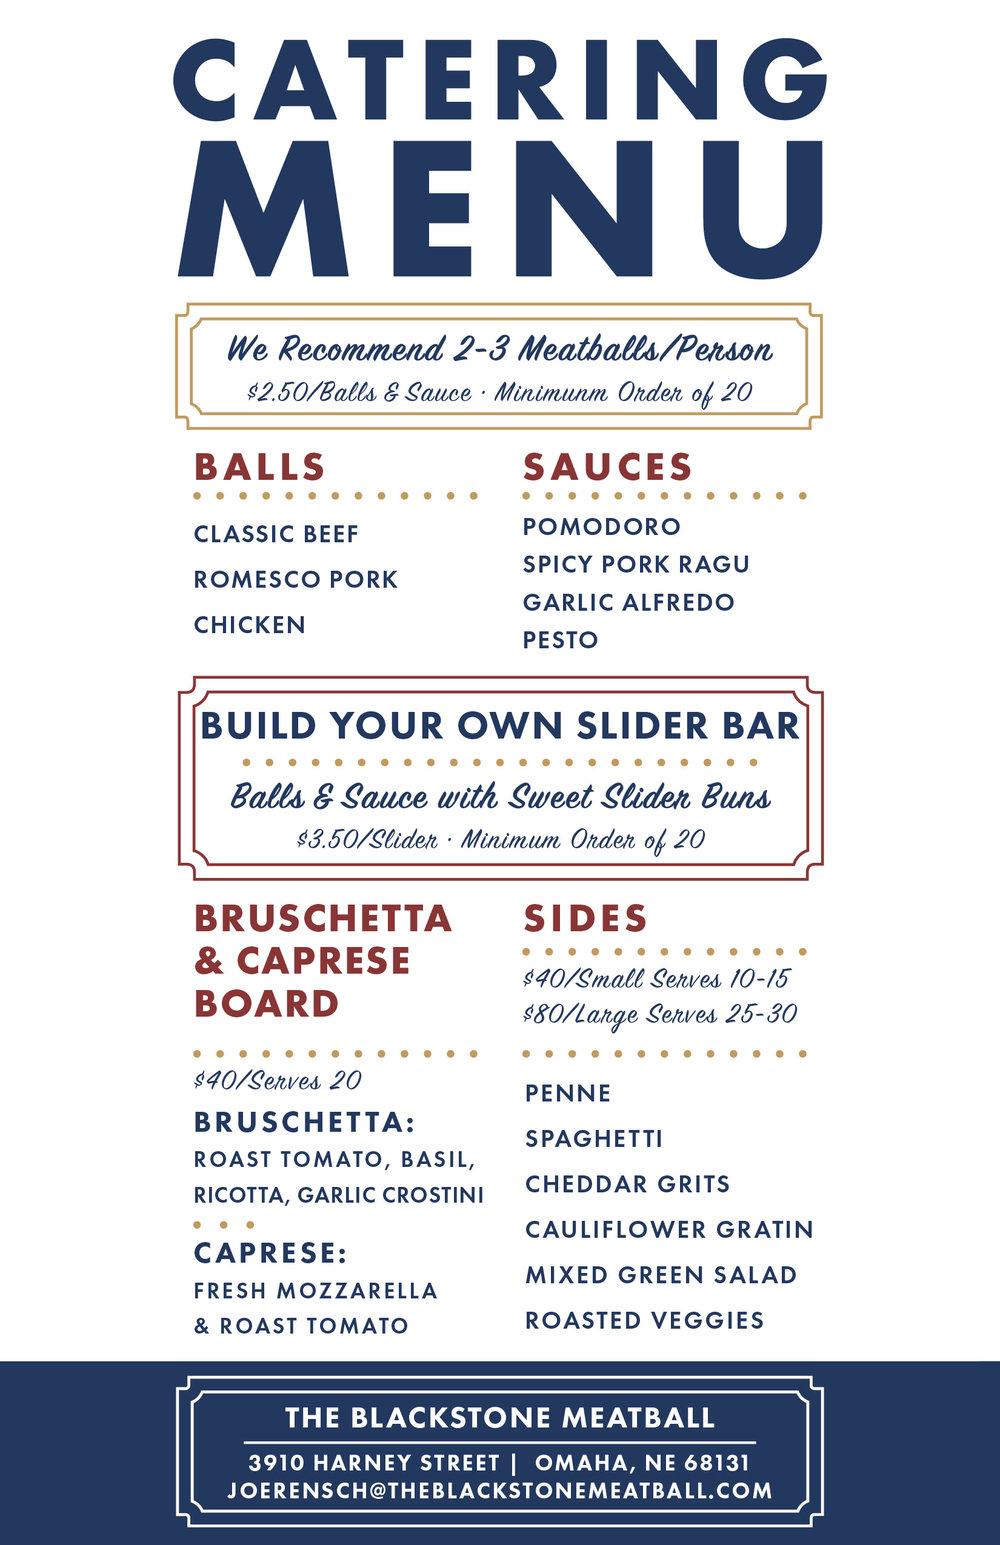 MeatballMenu_Catering_012218_t2.jpg